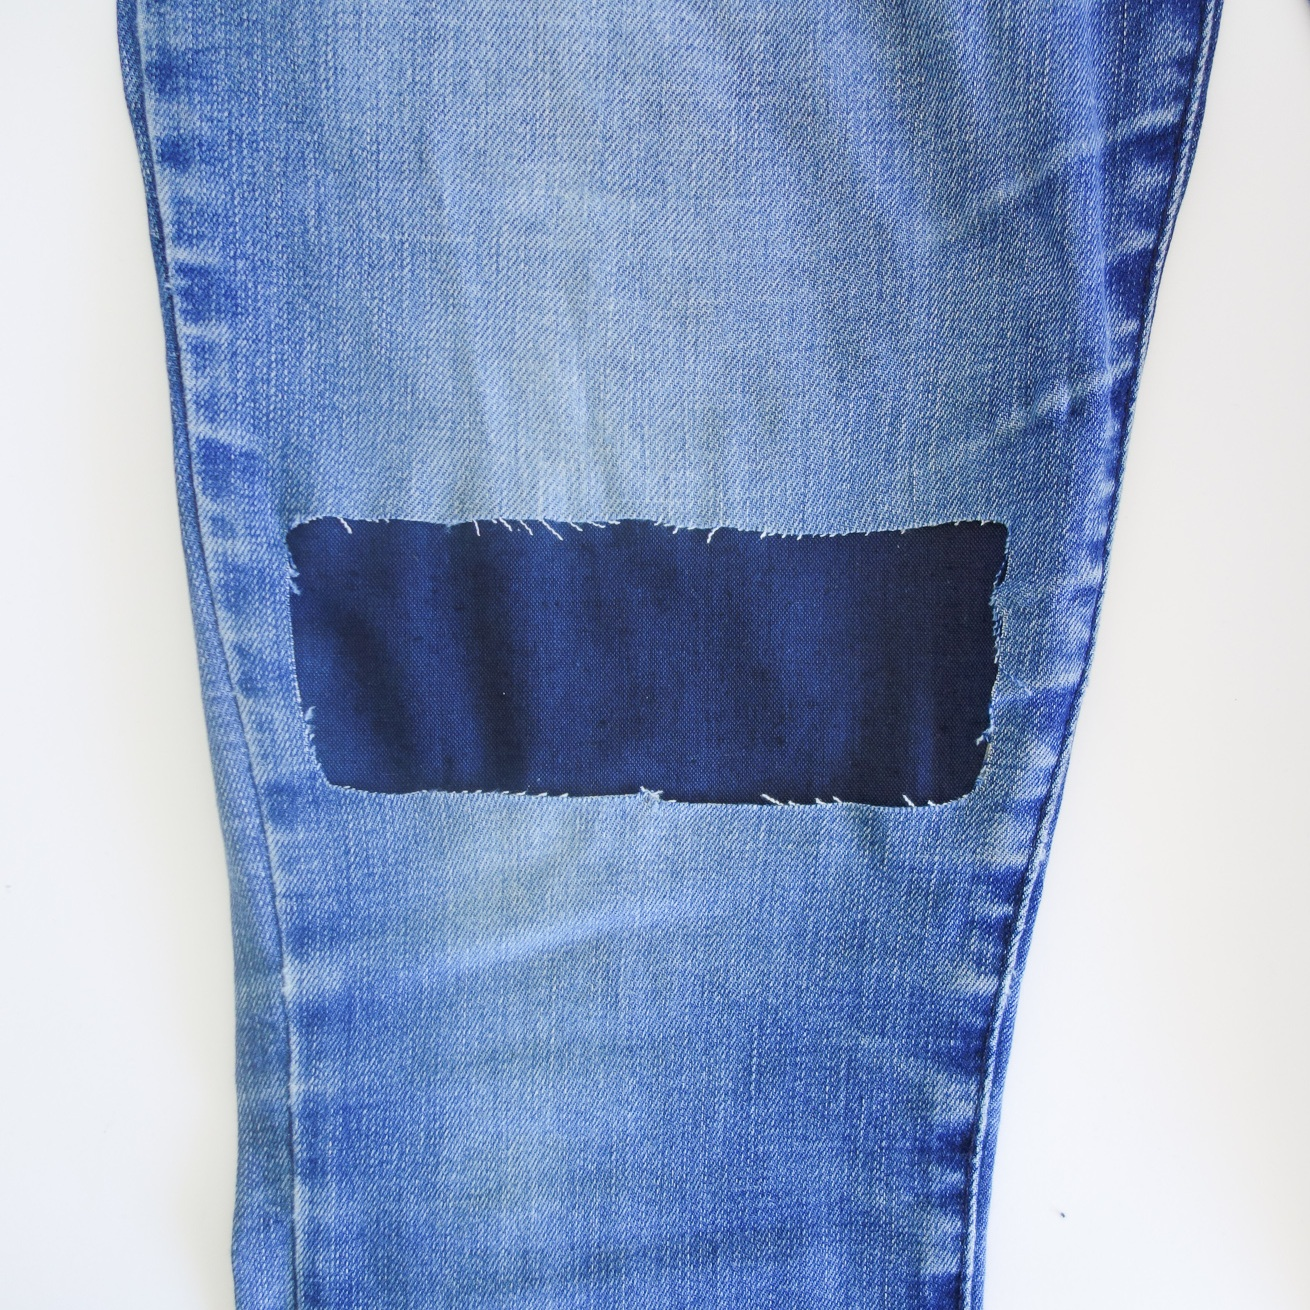 Jeans+patch.jpg